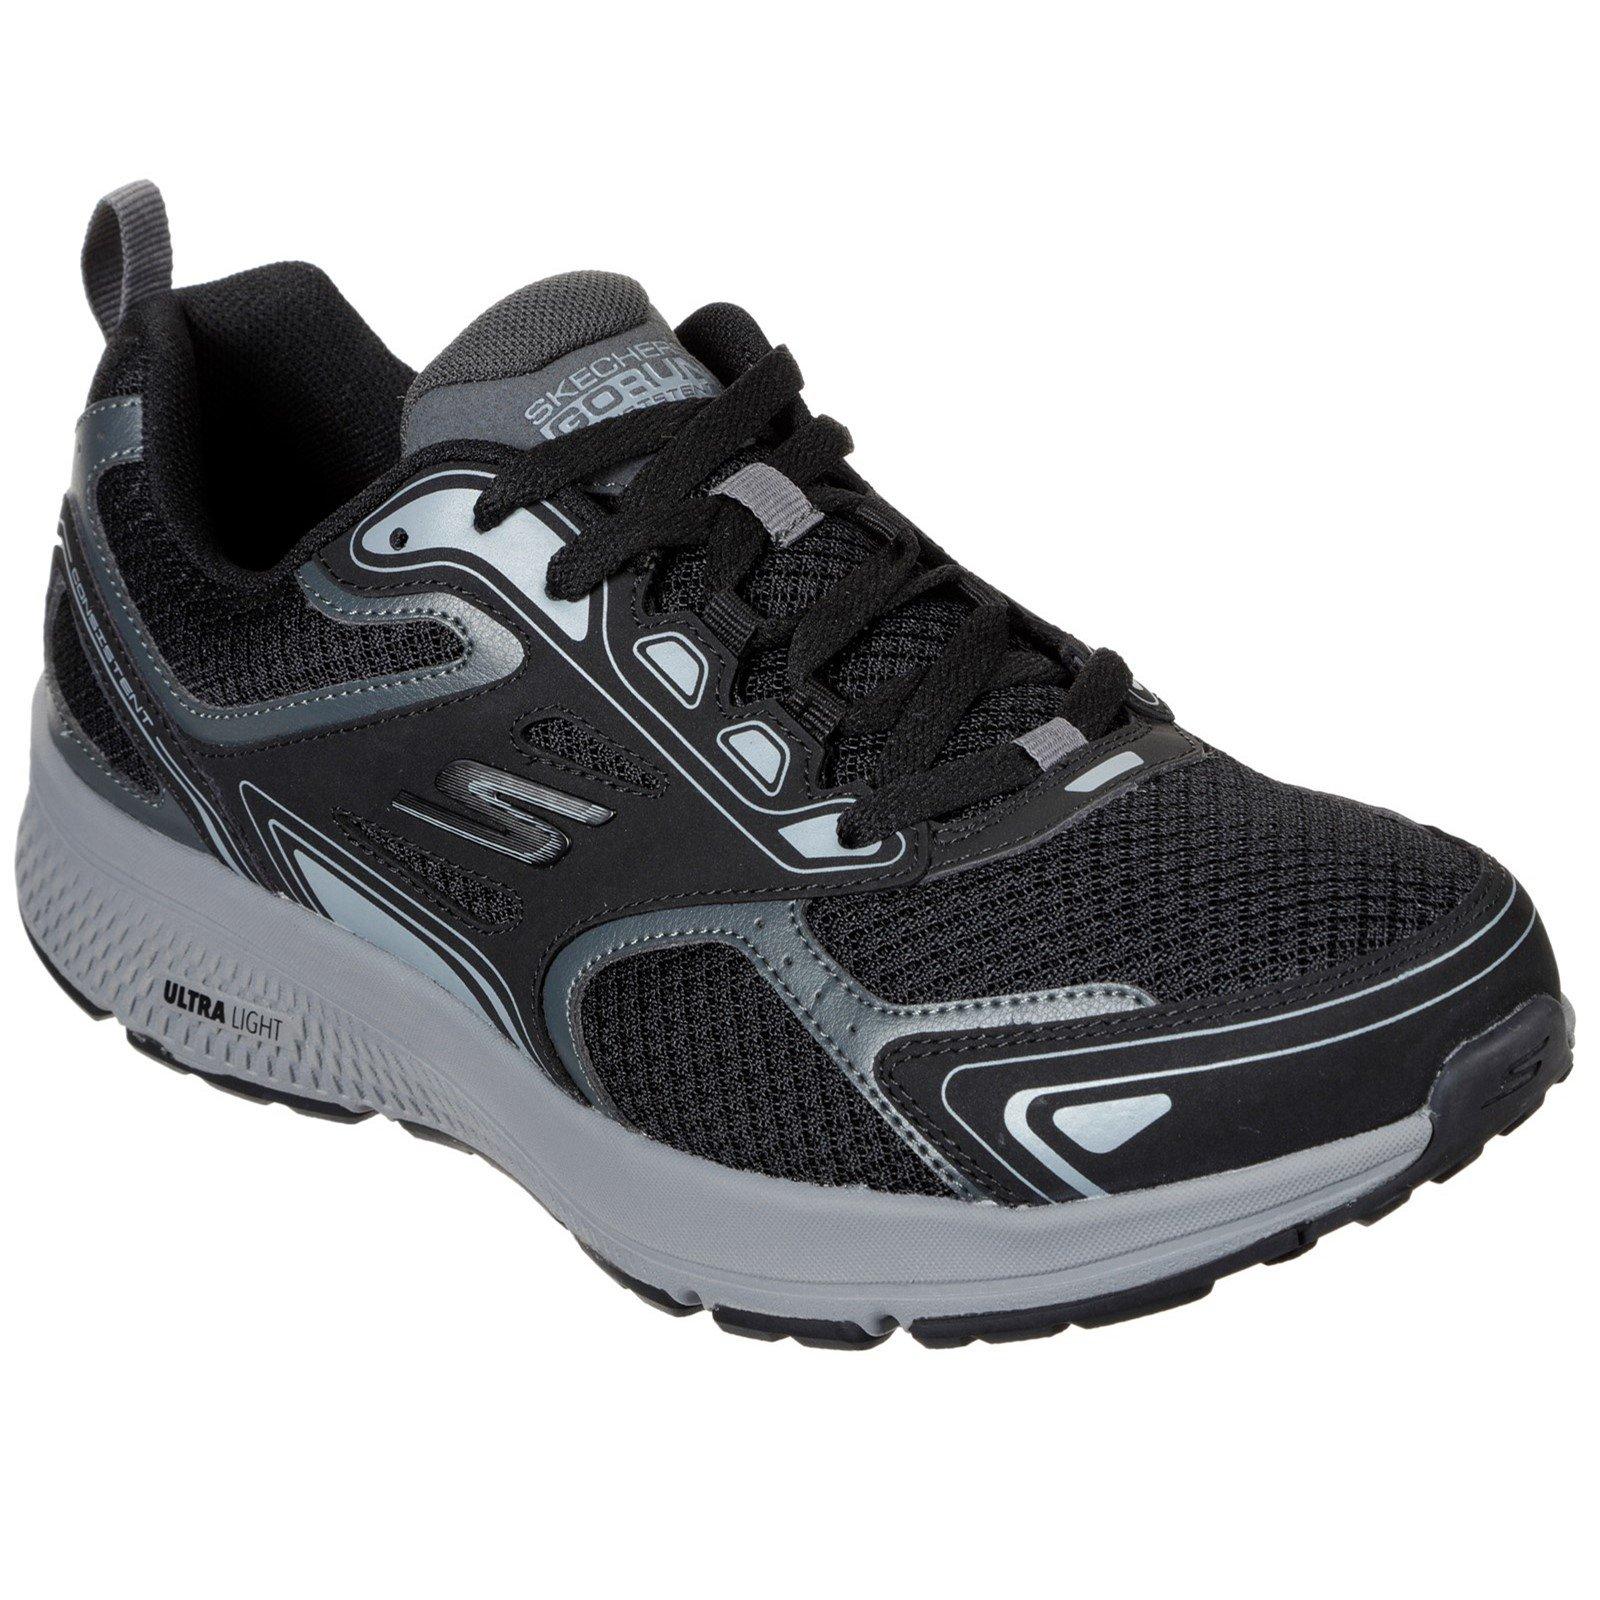 Skechers Men's Go Run Consistent Wide Trainer Multicolor 33072 - Black/Grey 7